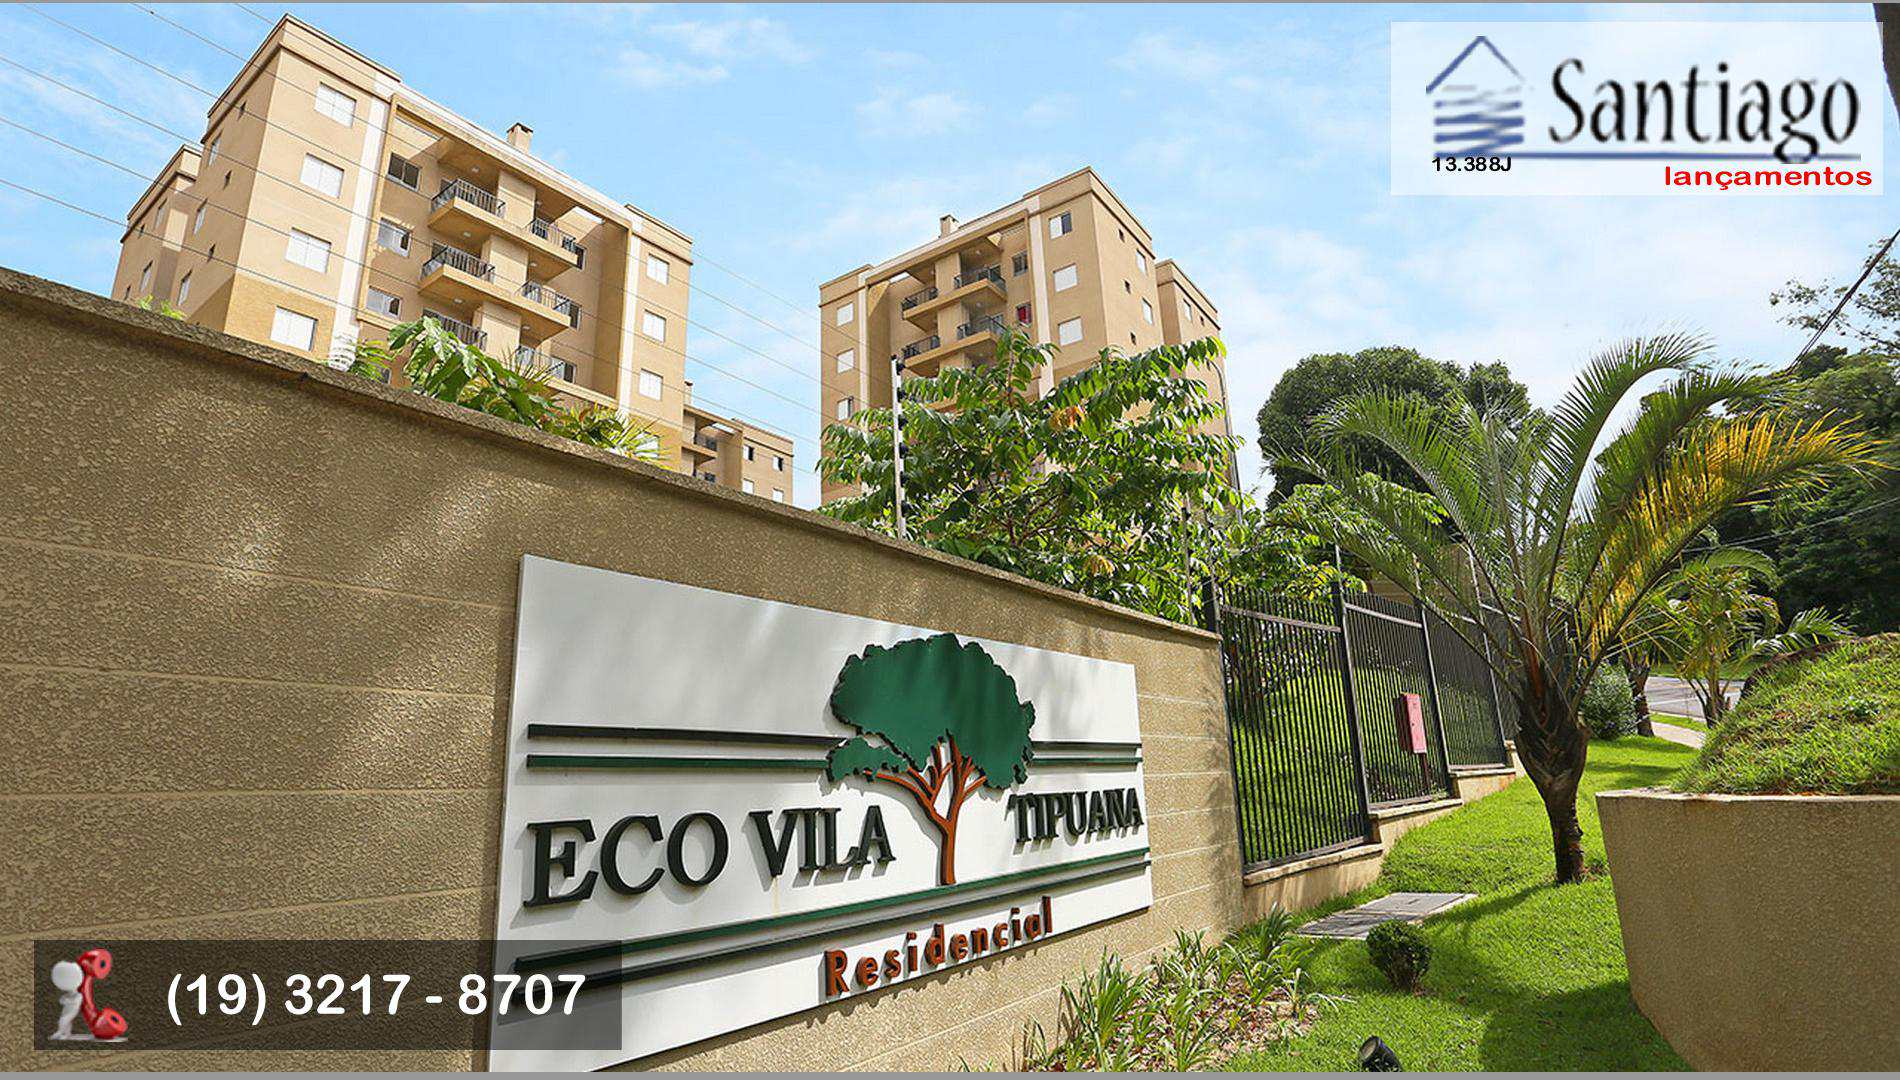 Eco Vila Tipuana